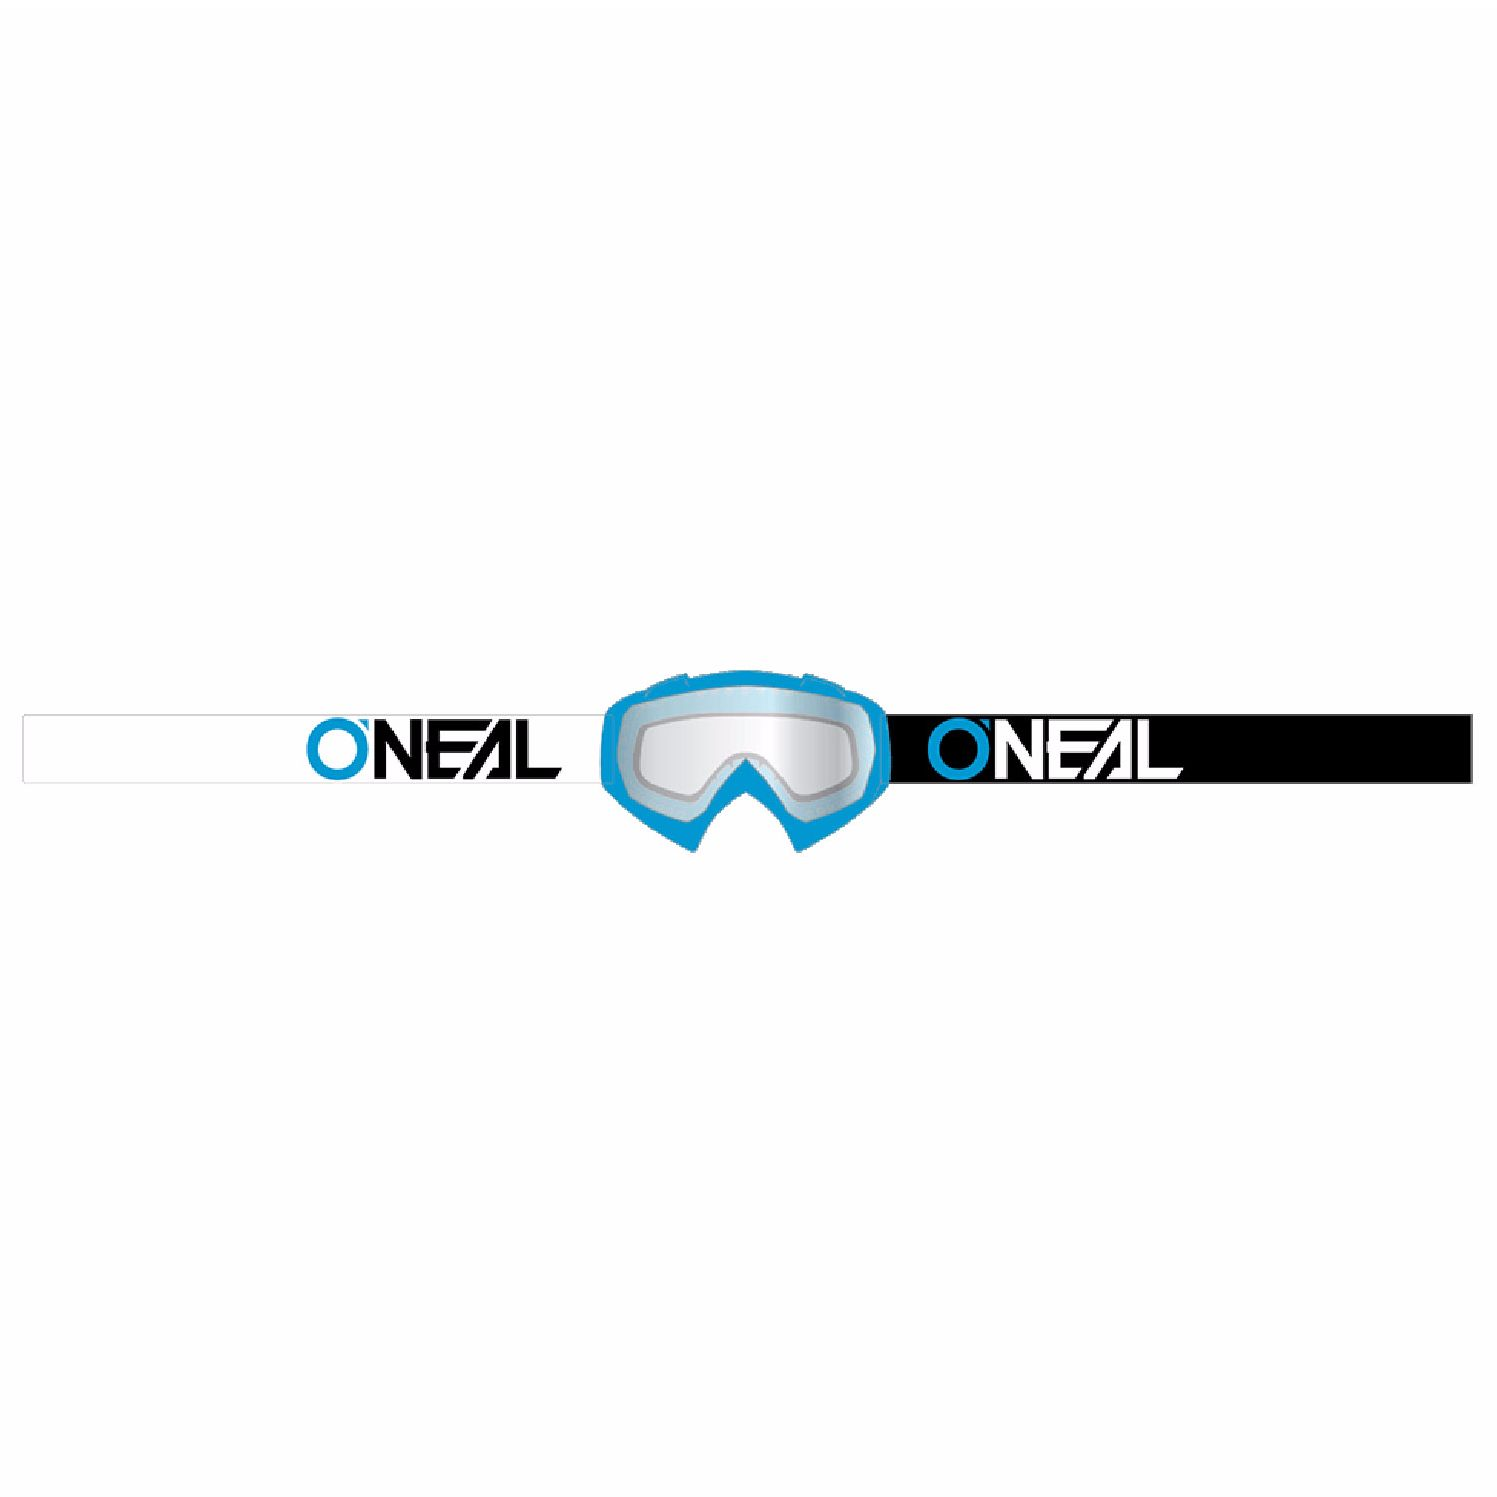 Masque Cross O'neal B-10 - Twoface Bleu - Ecran Clair -